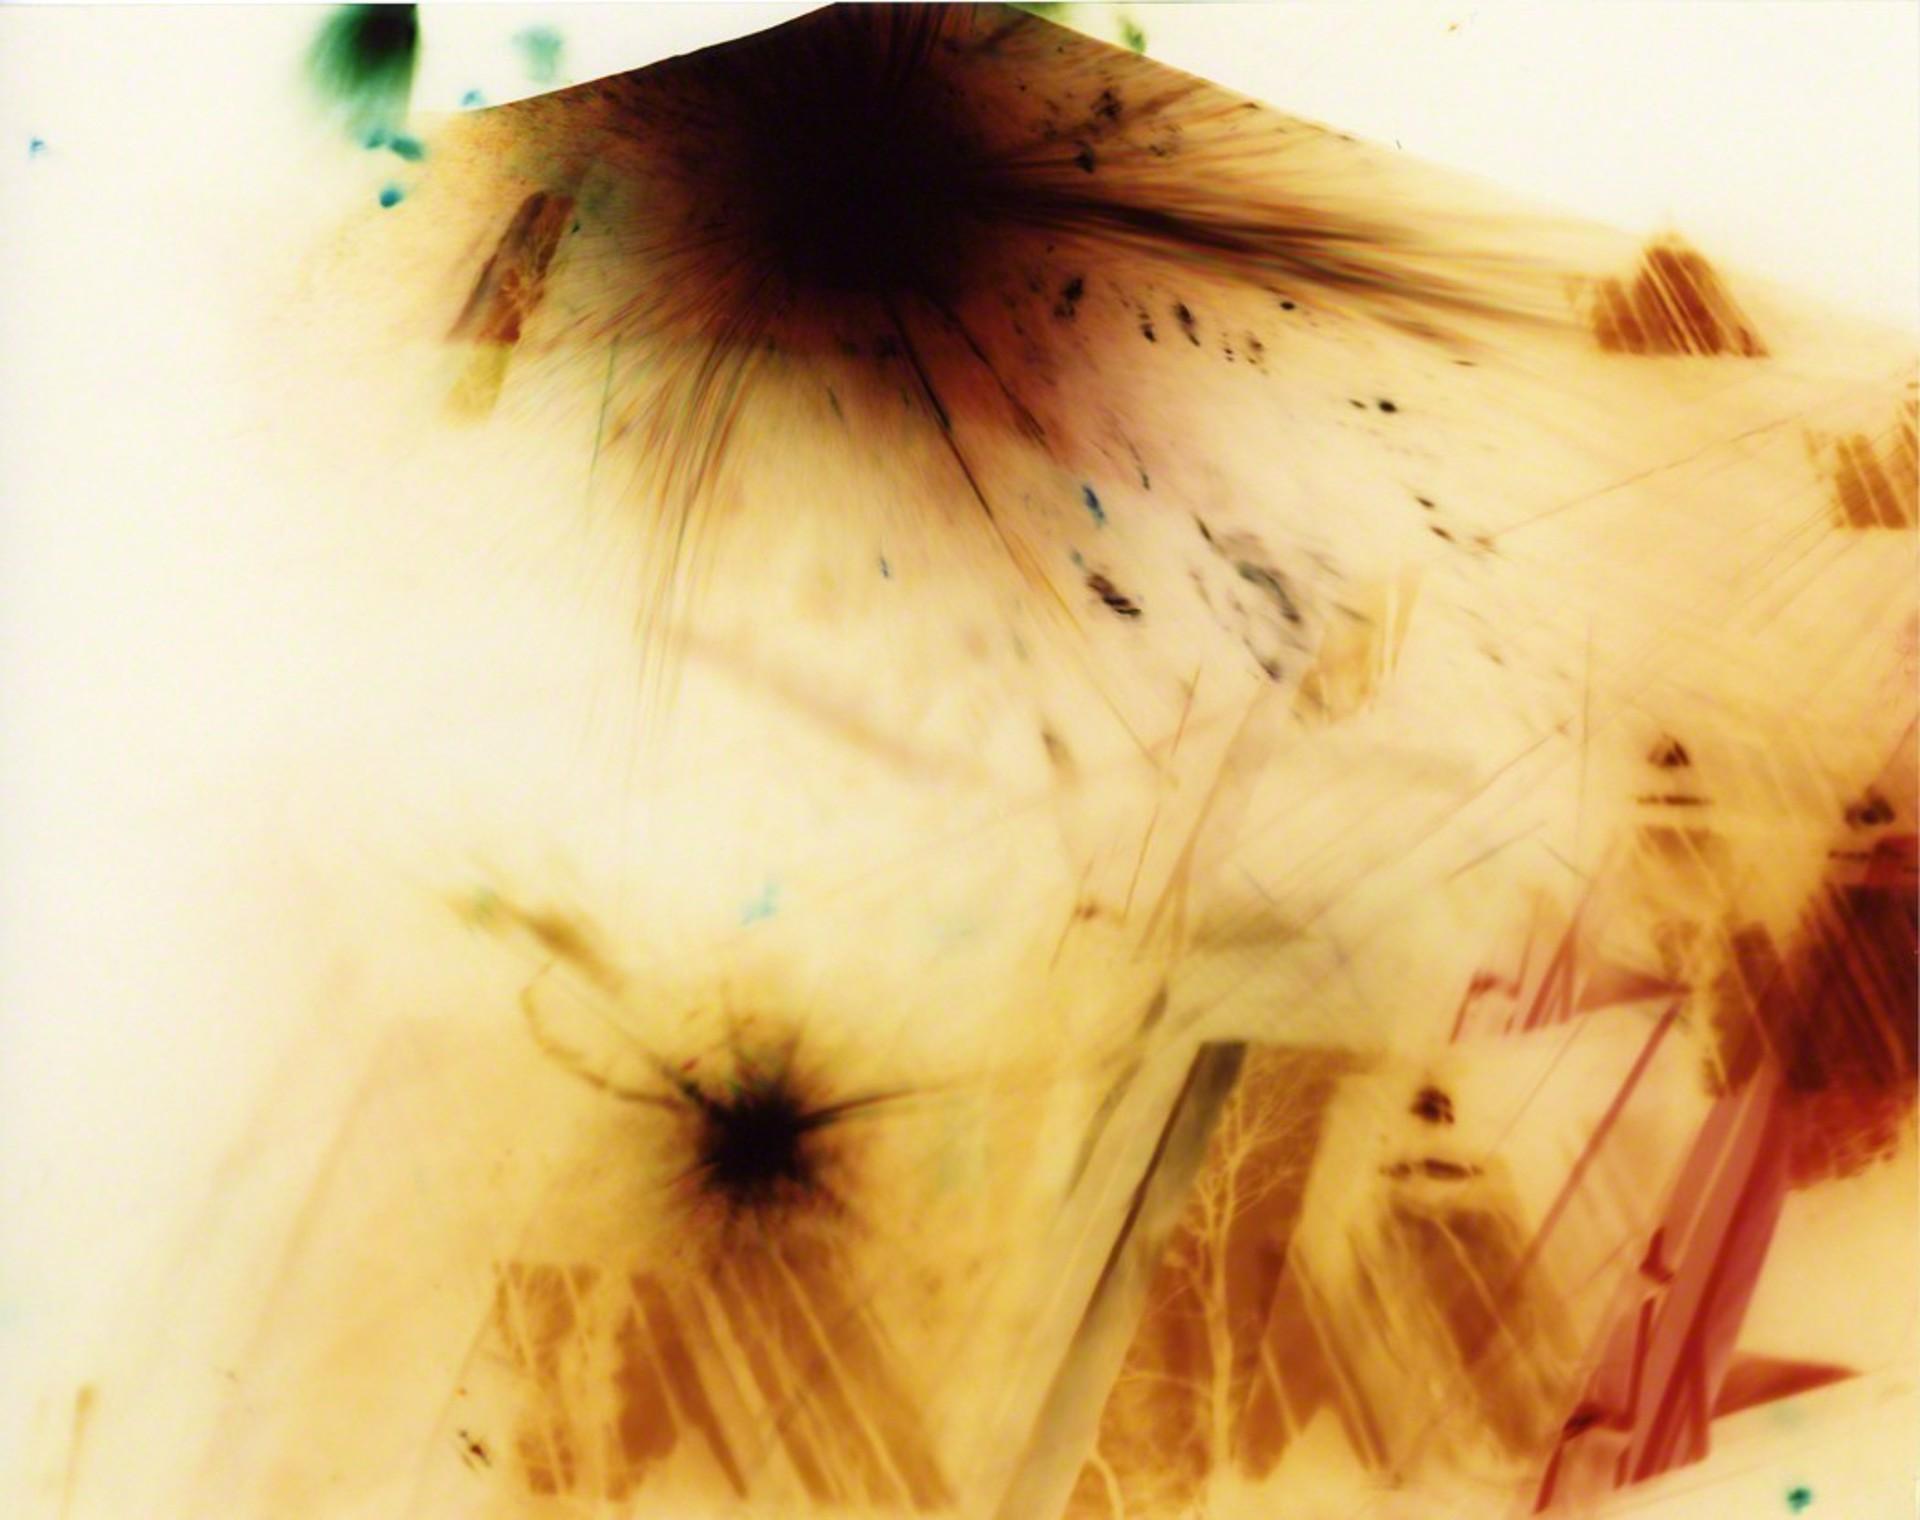 Pinhole 023 by Natalie Cheung